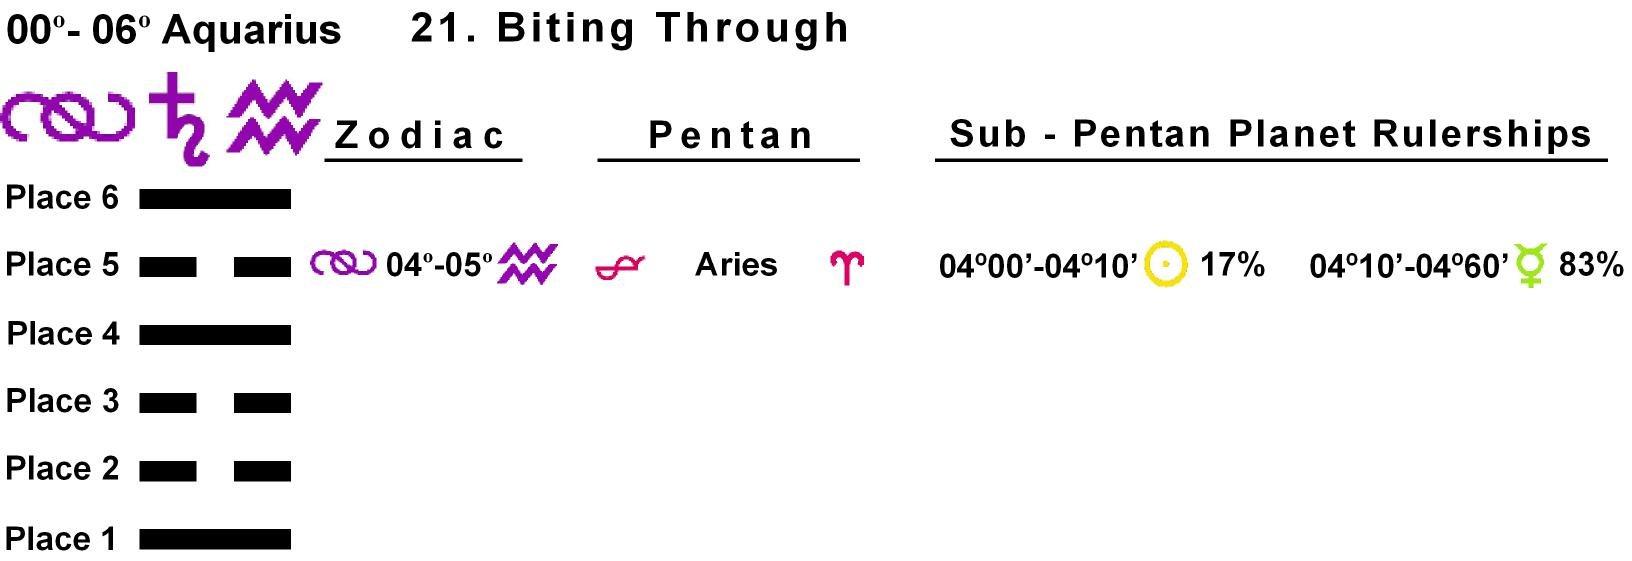 Pent-lines-11AQ 04-05 Hx-21 Biting Through